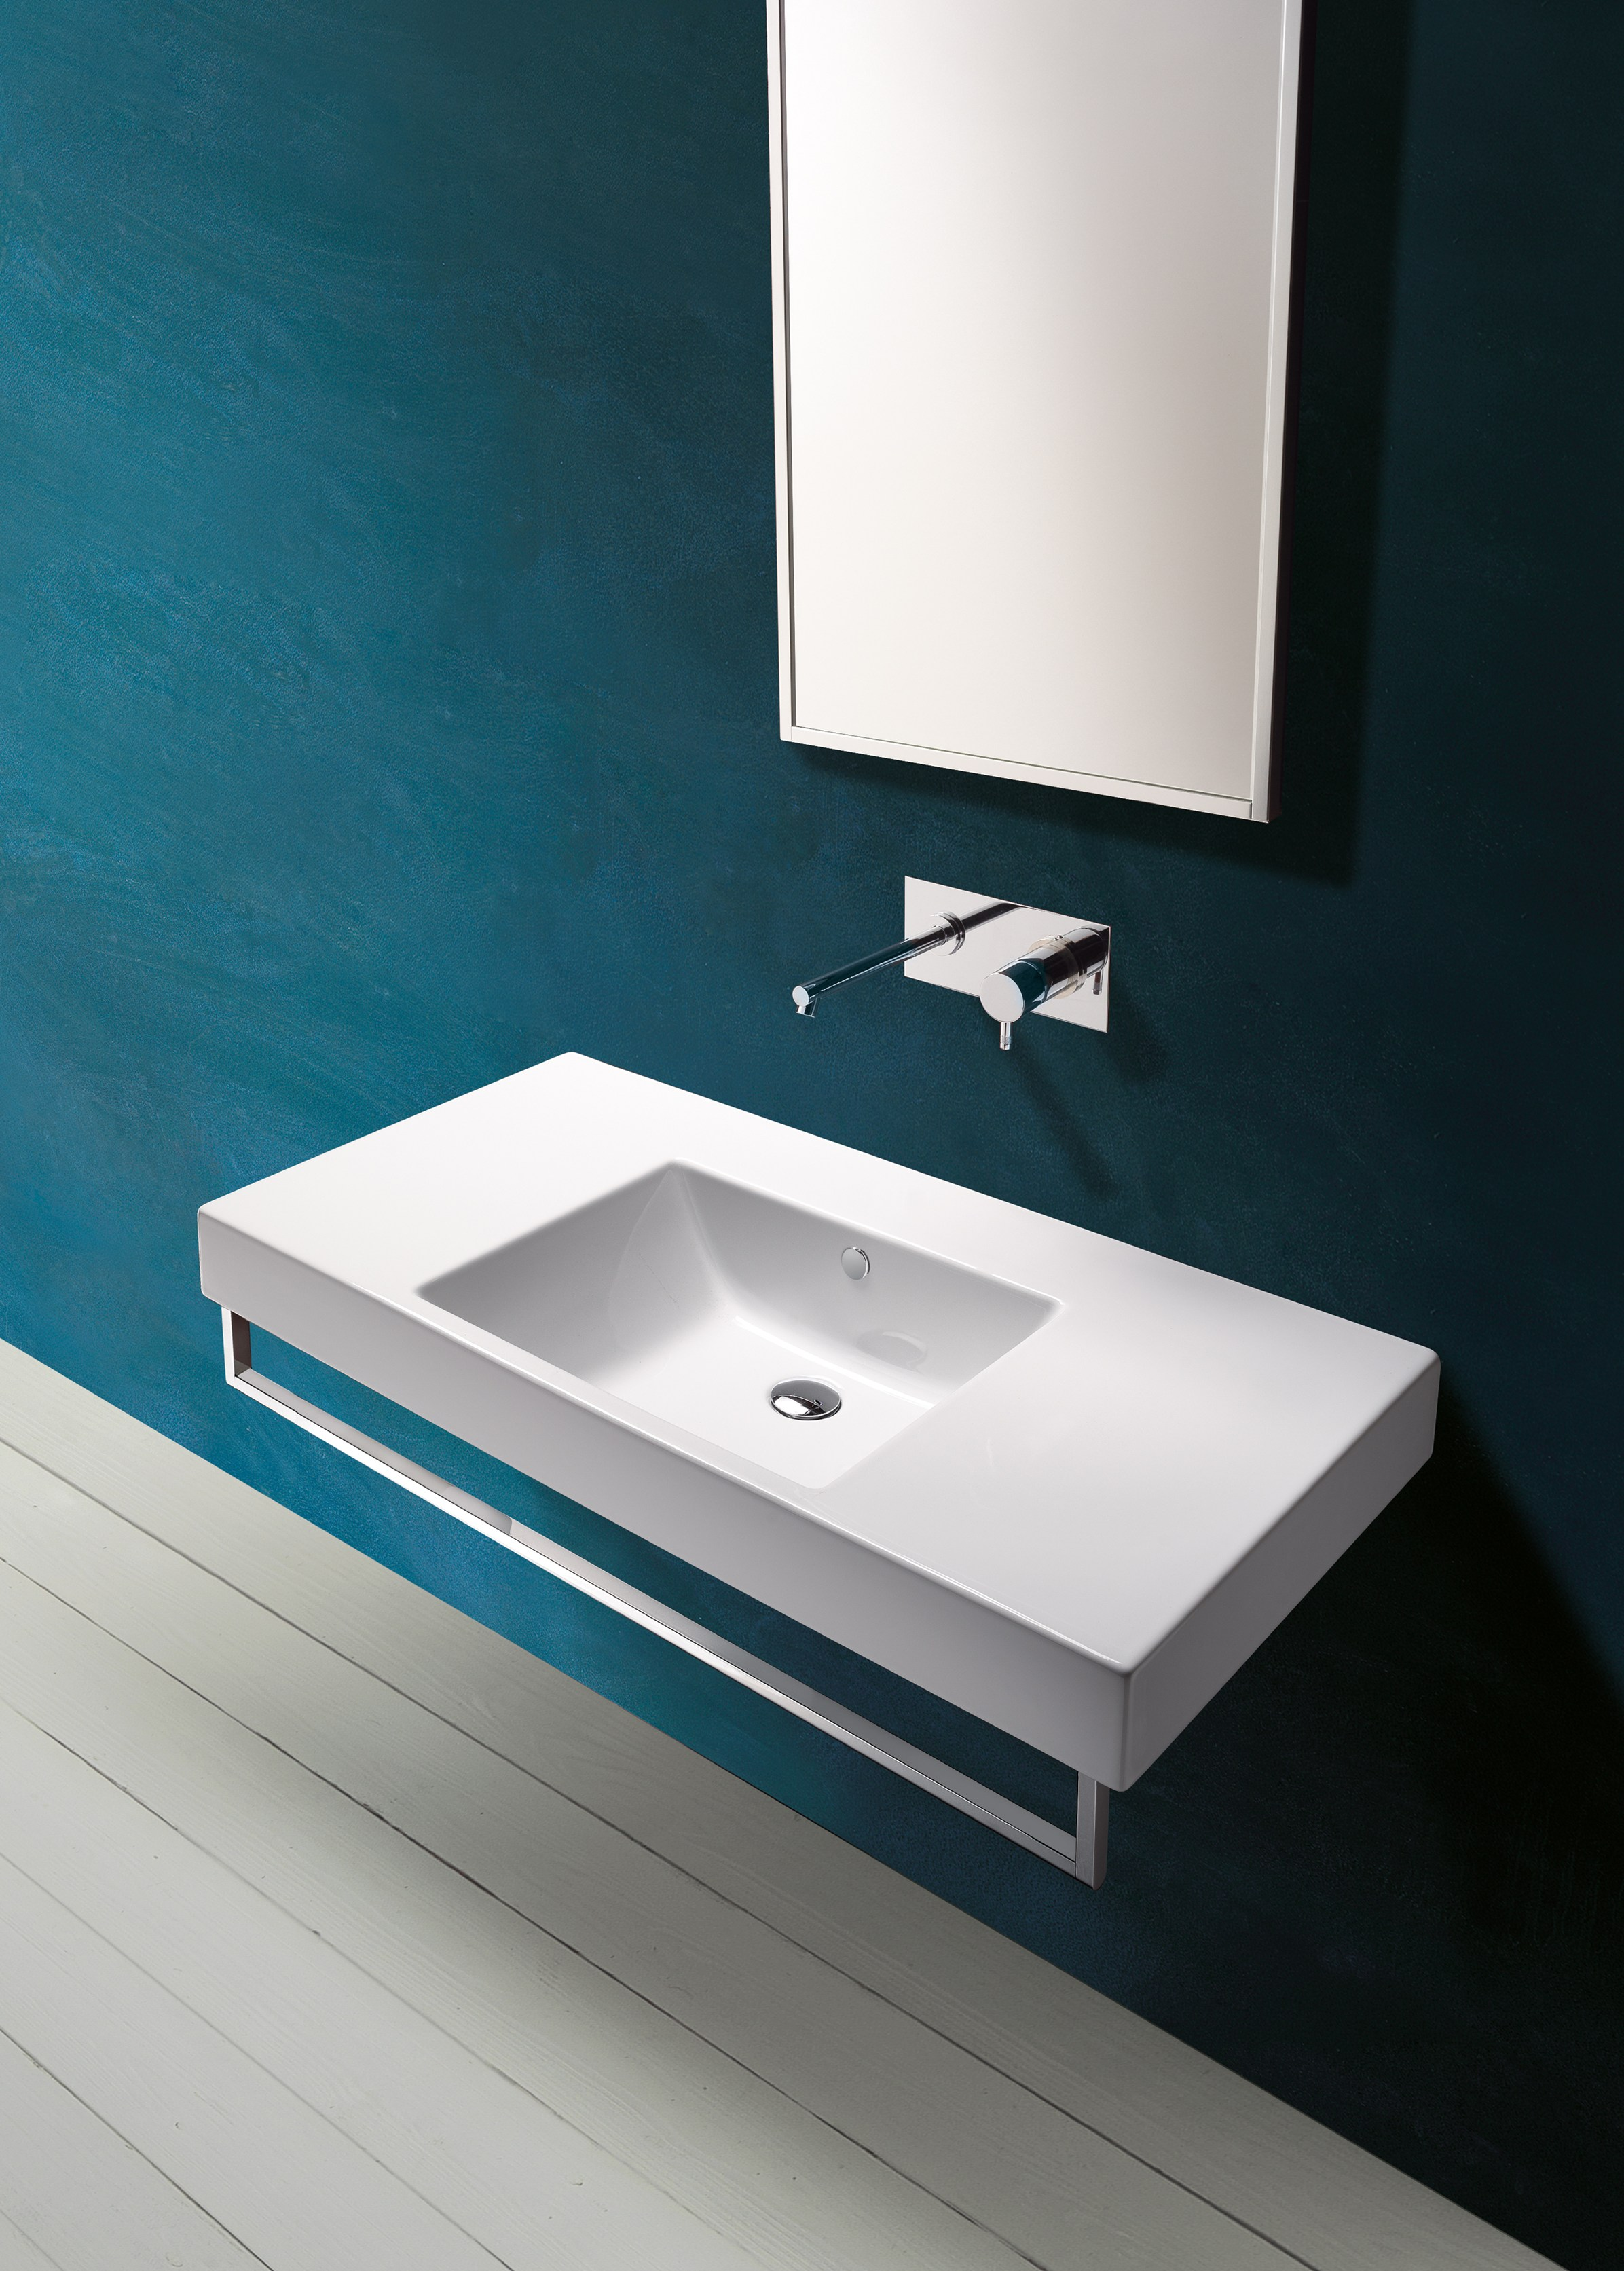 zero domino 100 waschbecken by ceramica catalano design. Black Bedroom Furniture Sets. Home Design Ideas